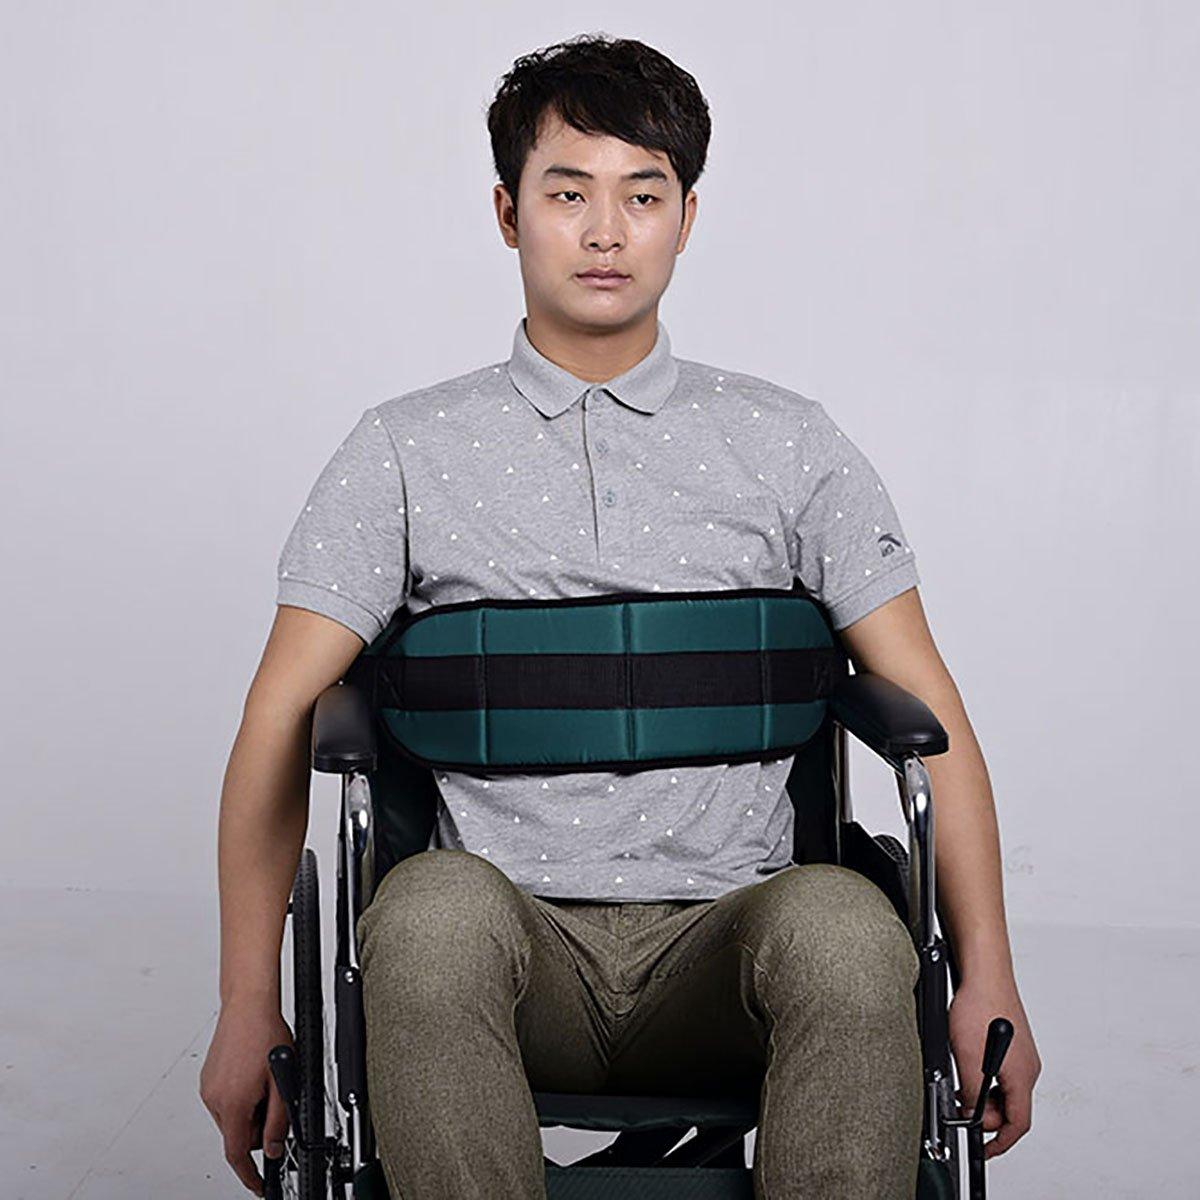 Chenhon Soft Cushion Belt, for Wheelchair or Bed